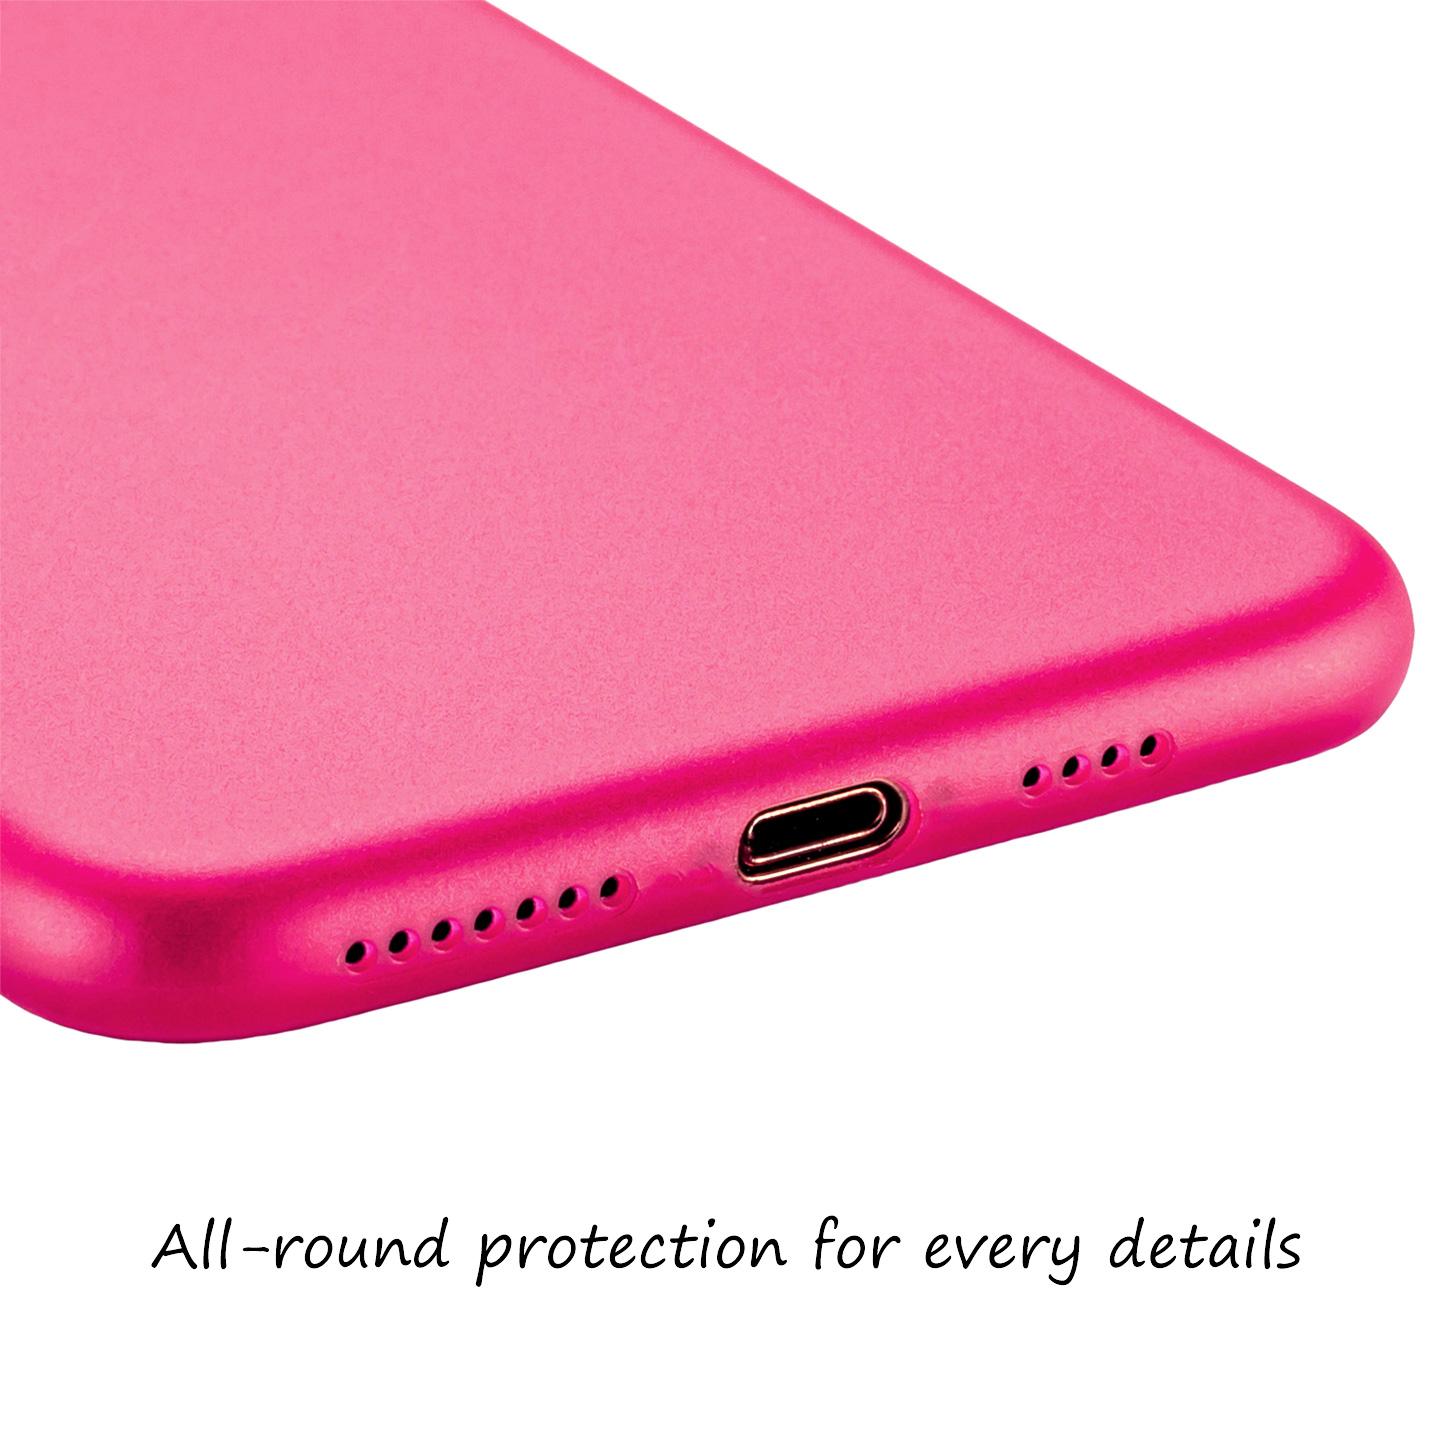 Ultra-Slim-Case-iPhone-11-Pro-5-8-034-Matt-Clear-Schutz-Huelle-Skin-Cover-Etui-Folie Indexbild 20